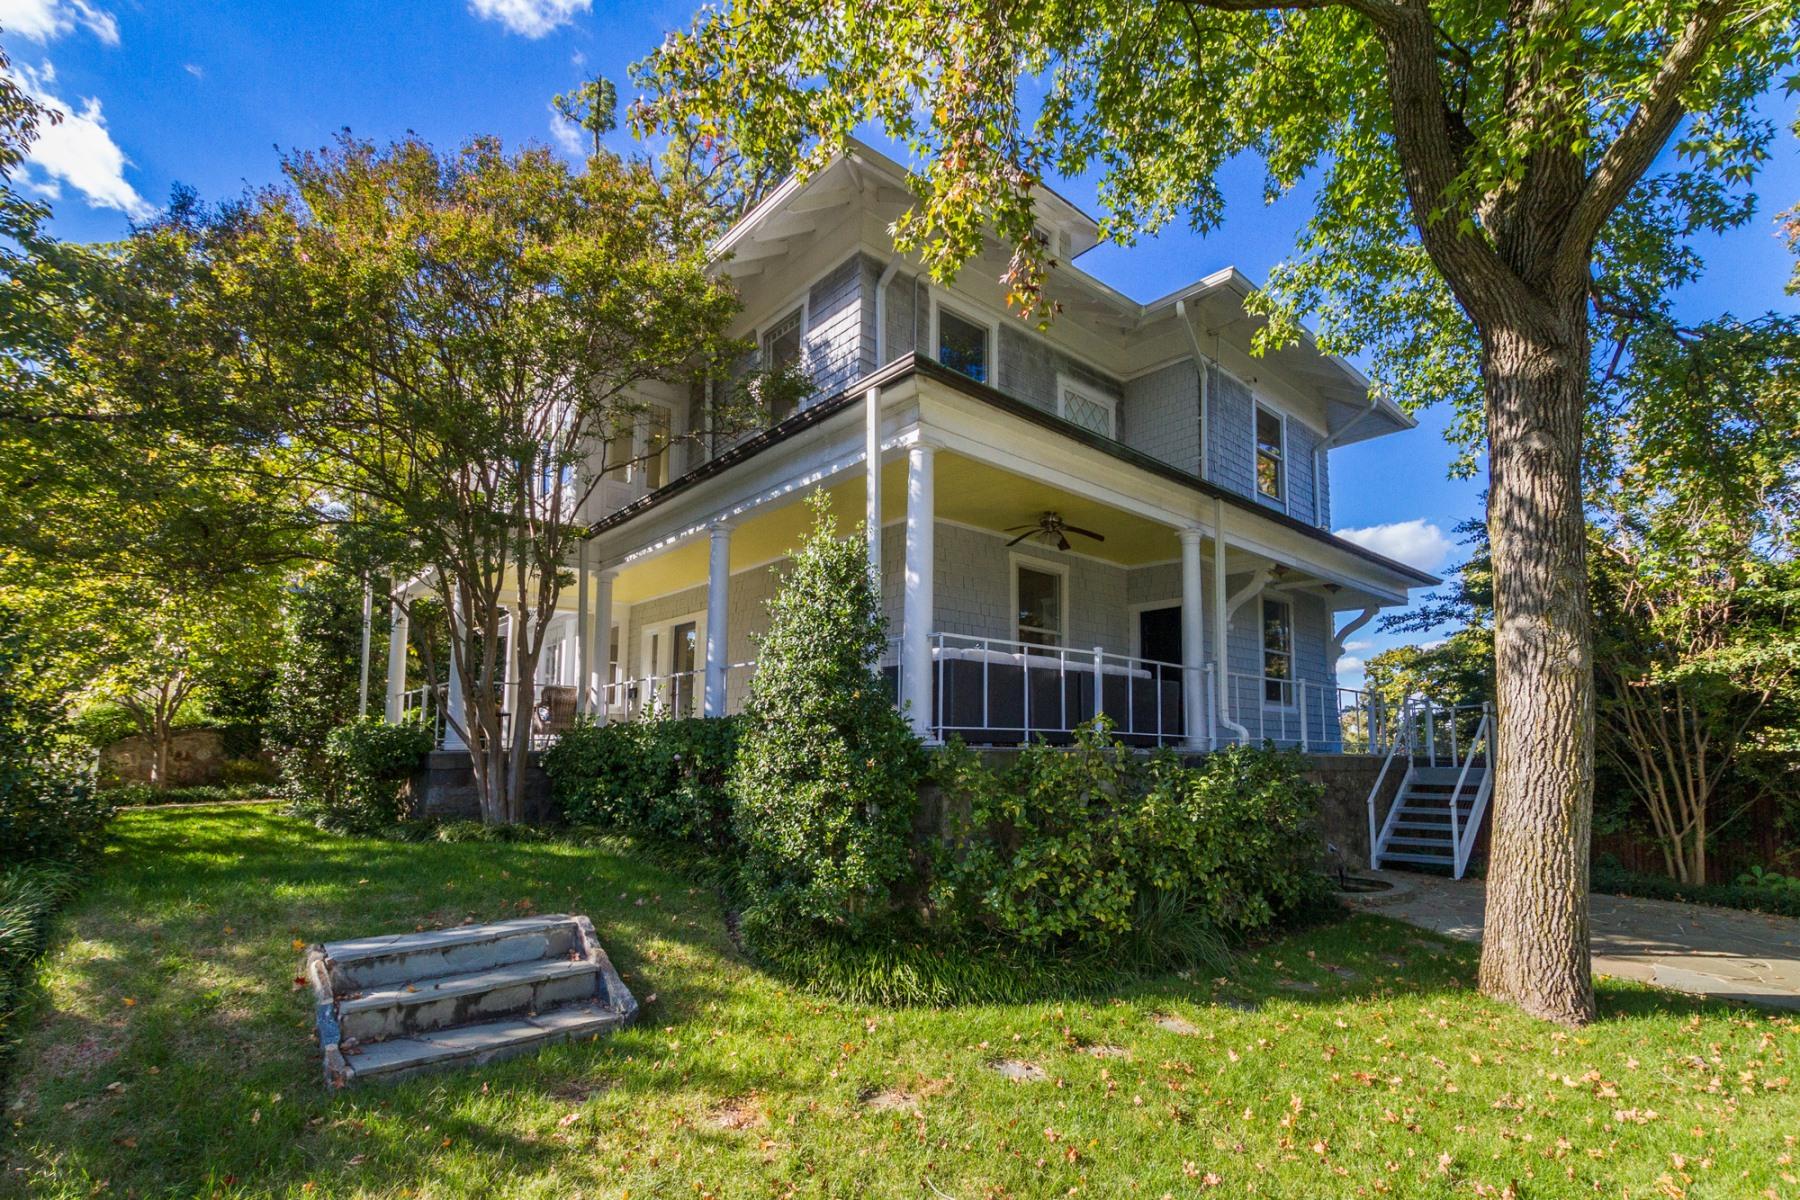 Property For Sale at 3031 Newark Street Nw, Washington